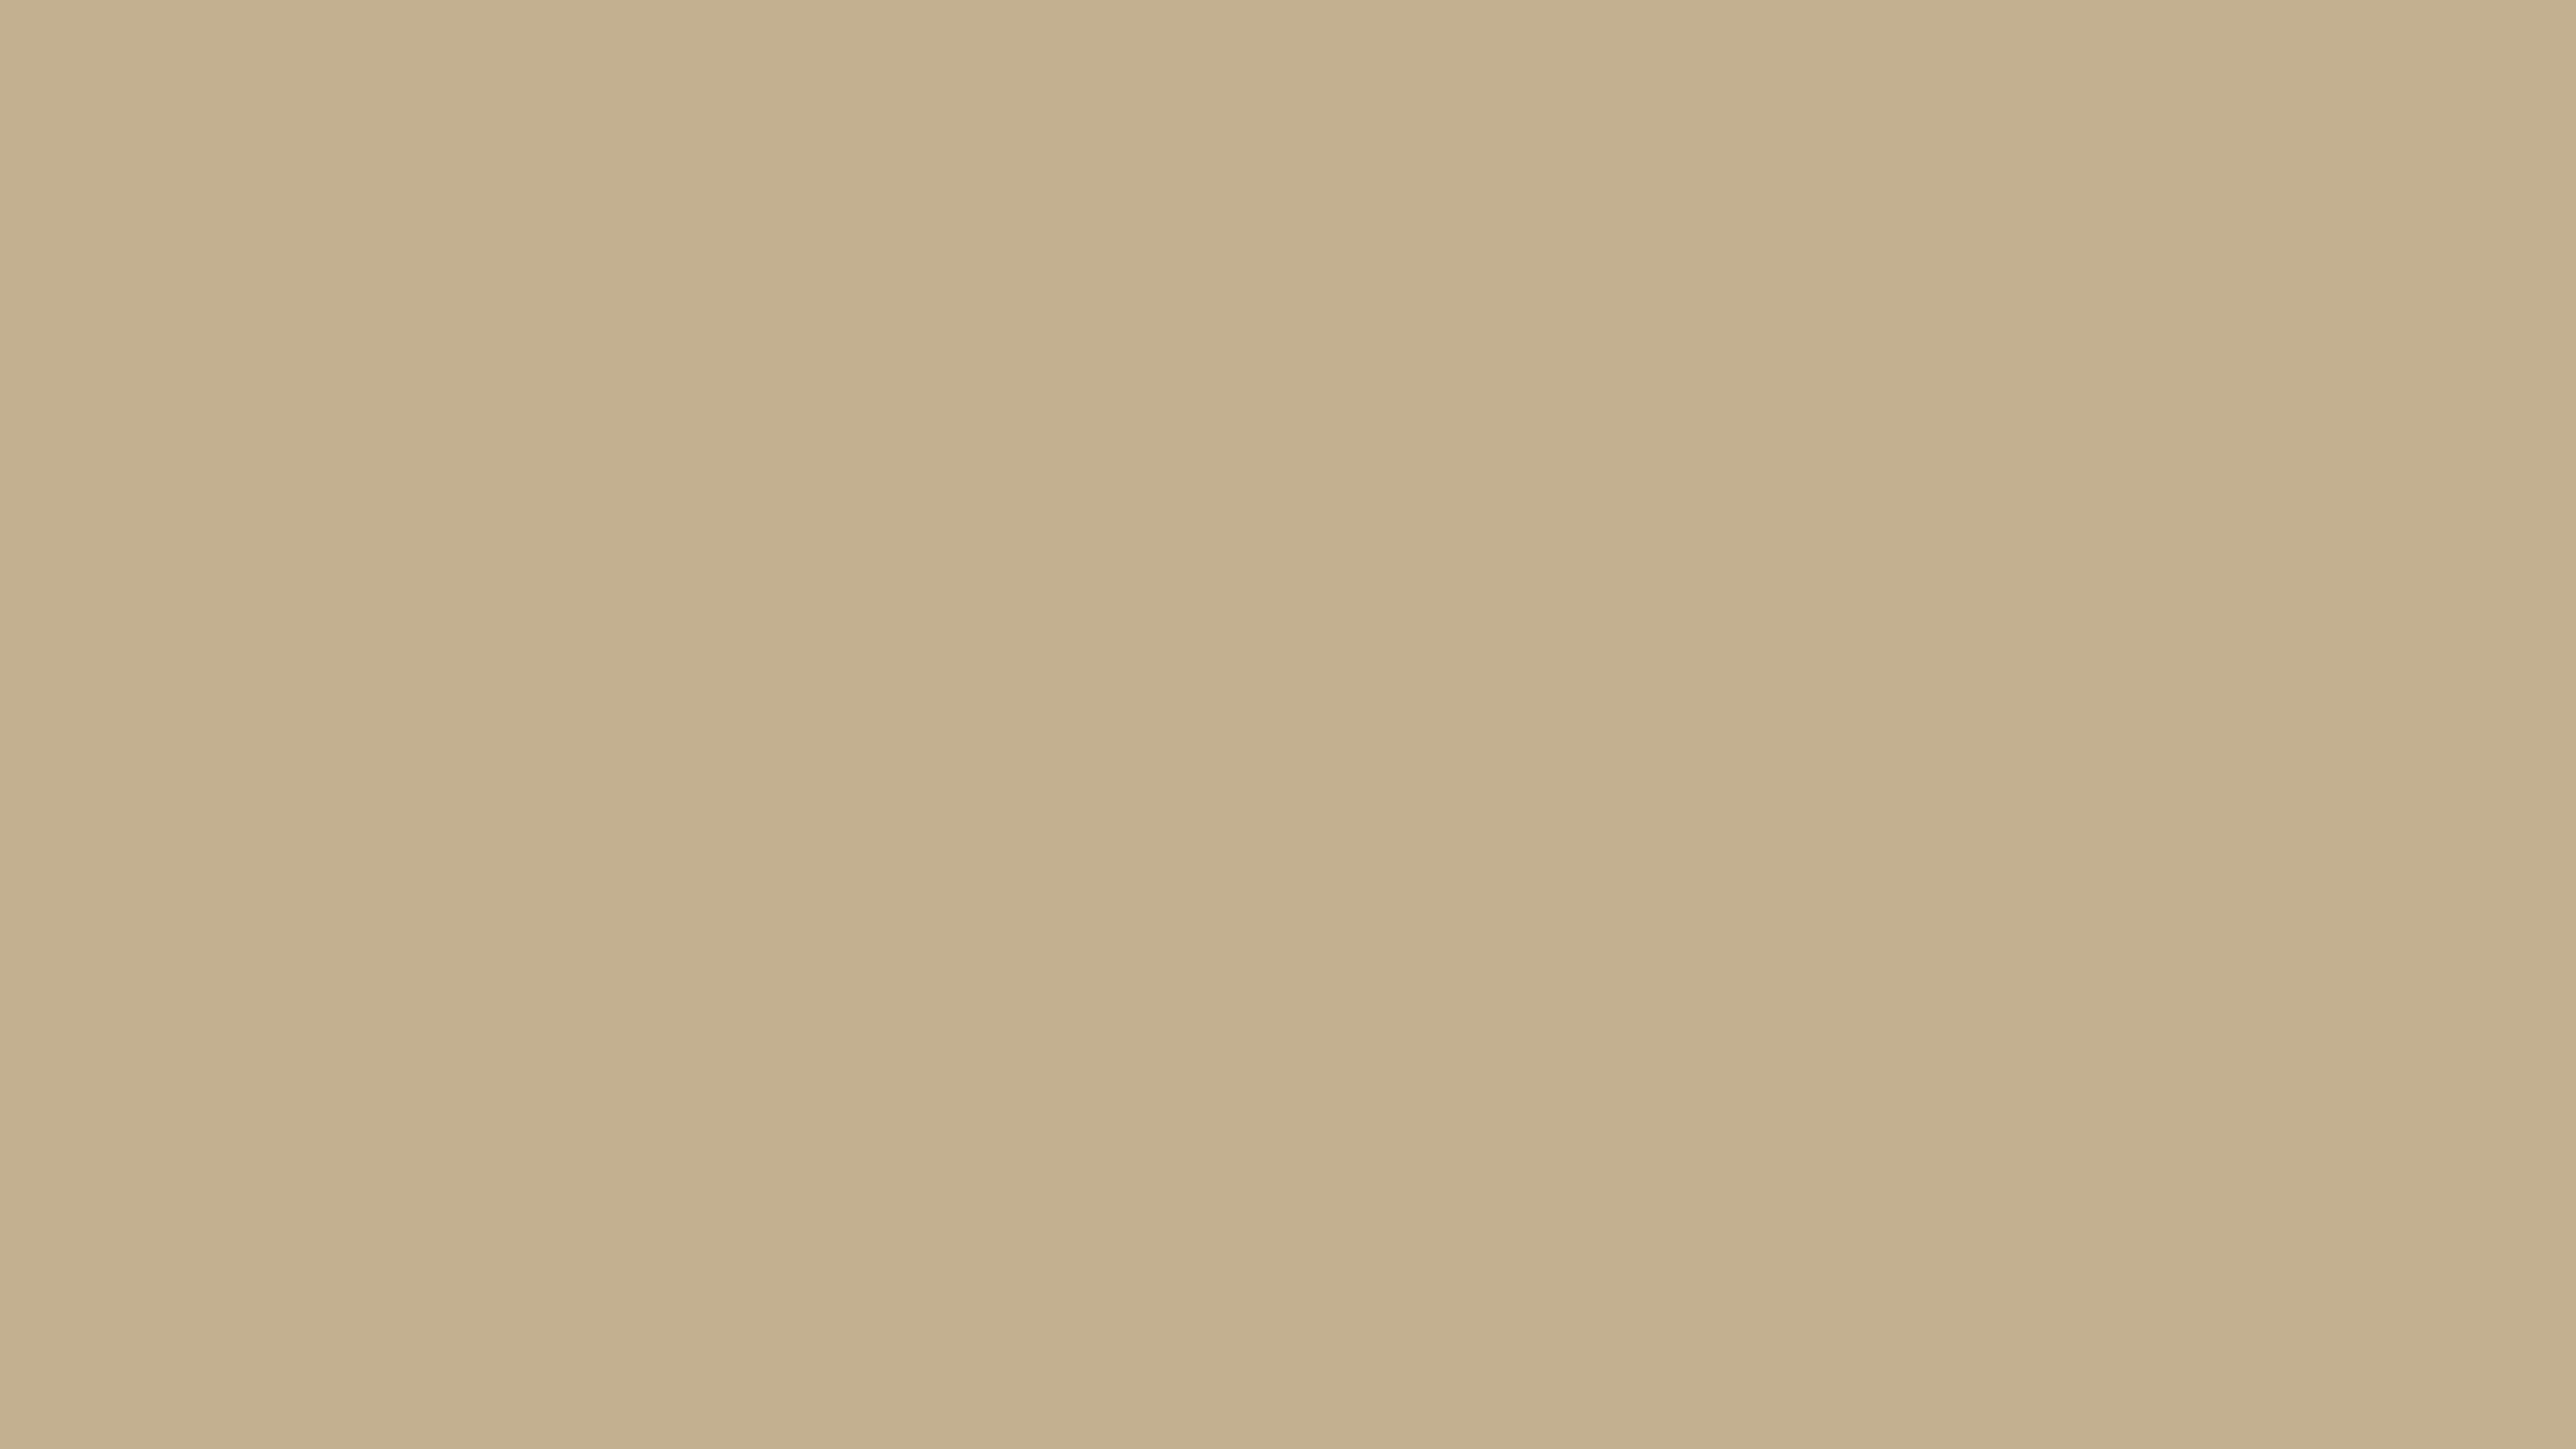 3840x2160 Khaki Web Solid Color Background